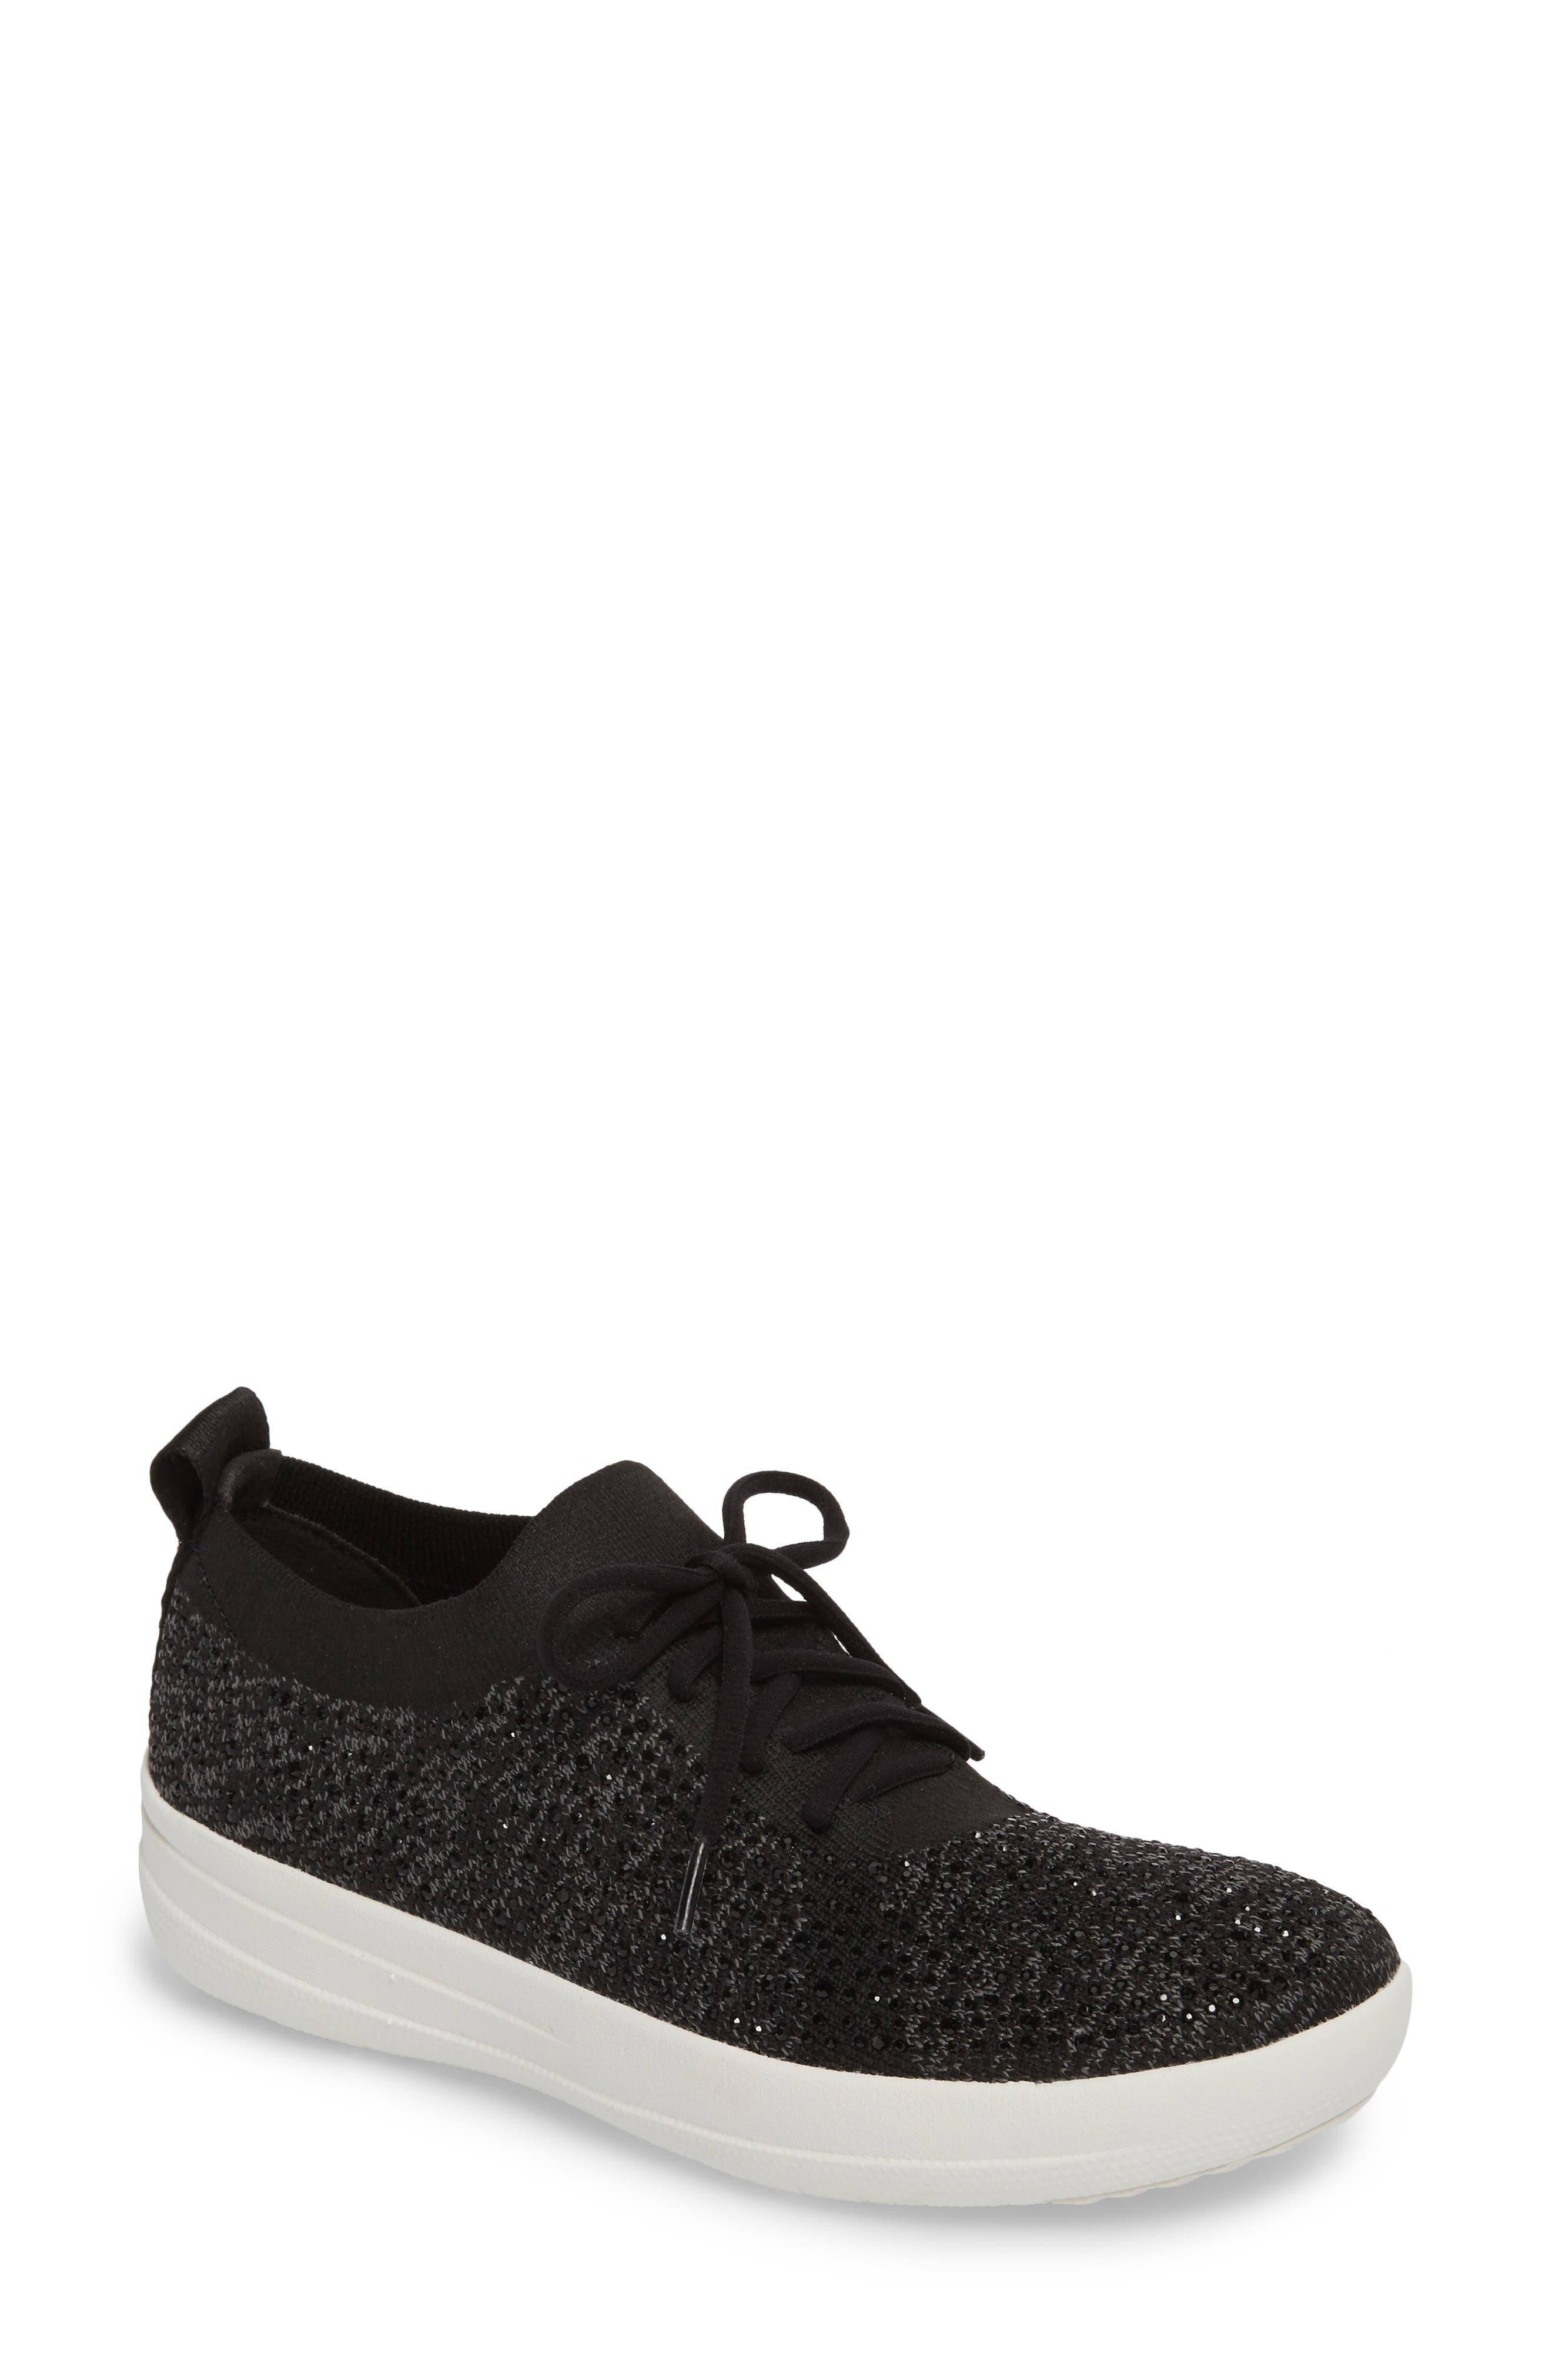 Uberknit<sup>™</sup> F-Sporty Sneaker,                         Main,                         color, BLACK LEATHER